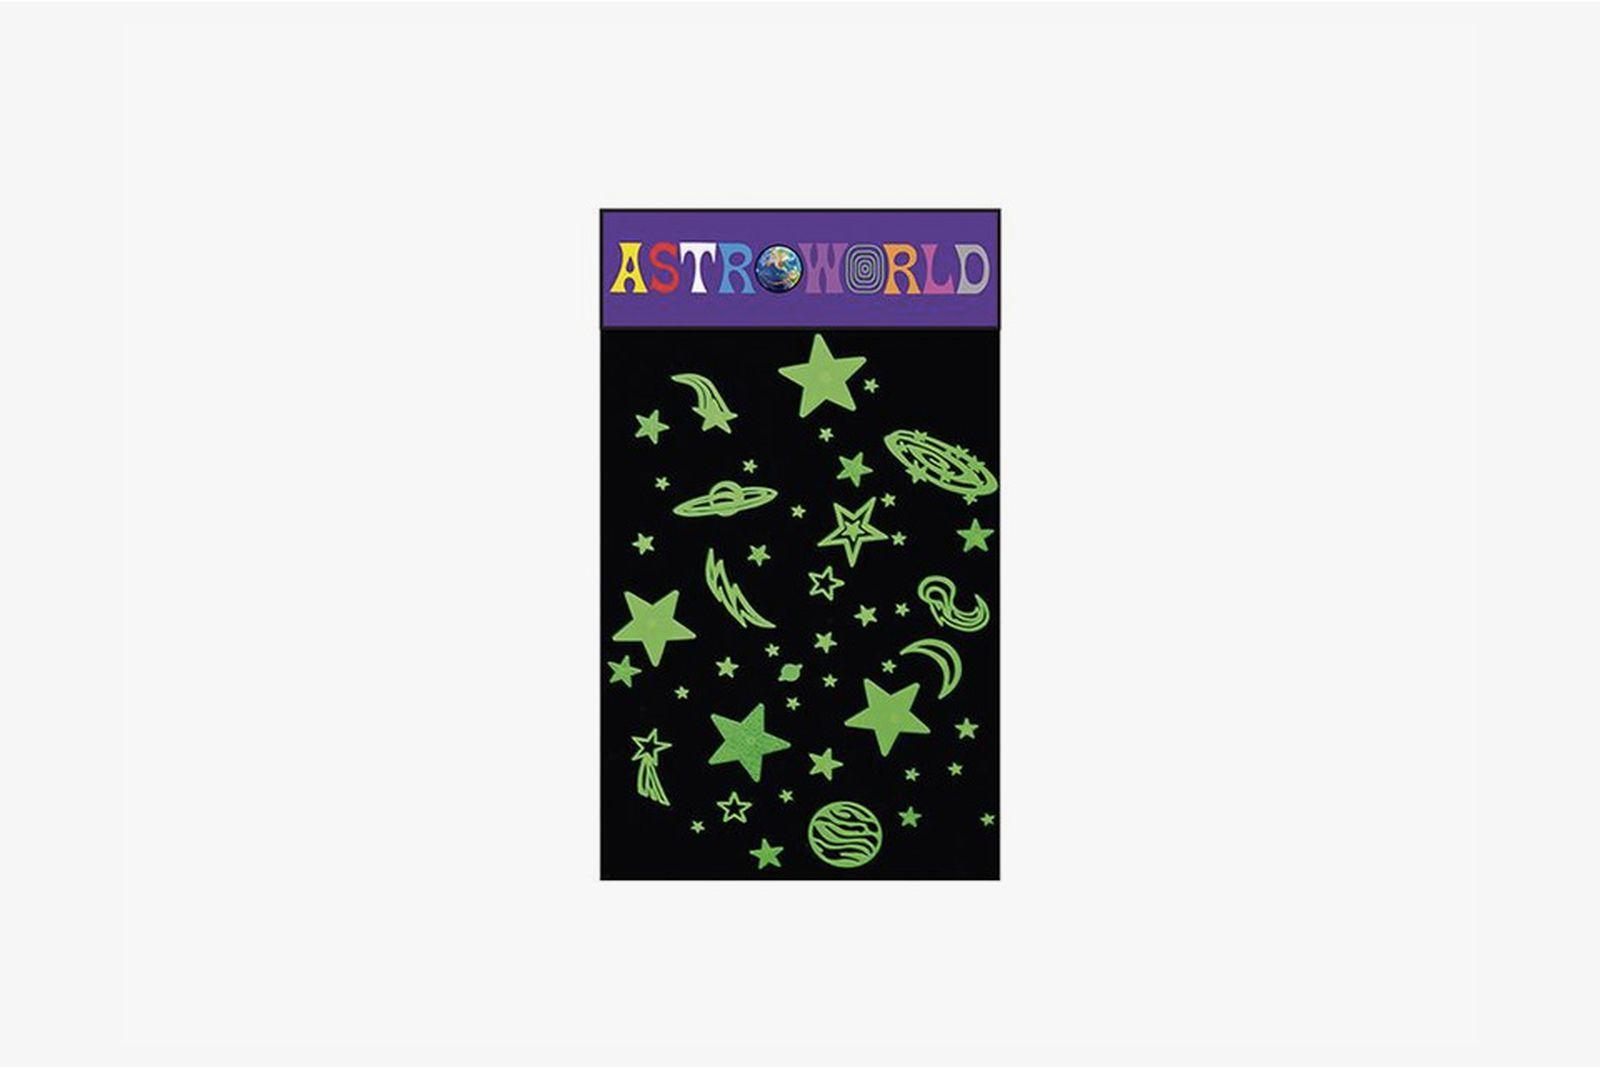 travis scott astroworld merch reup ASAP Ferg Merchandise brockhampton